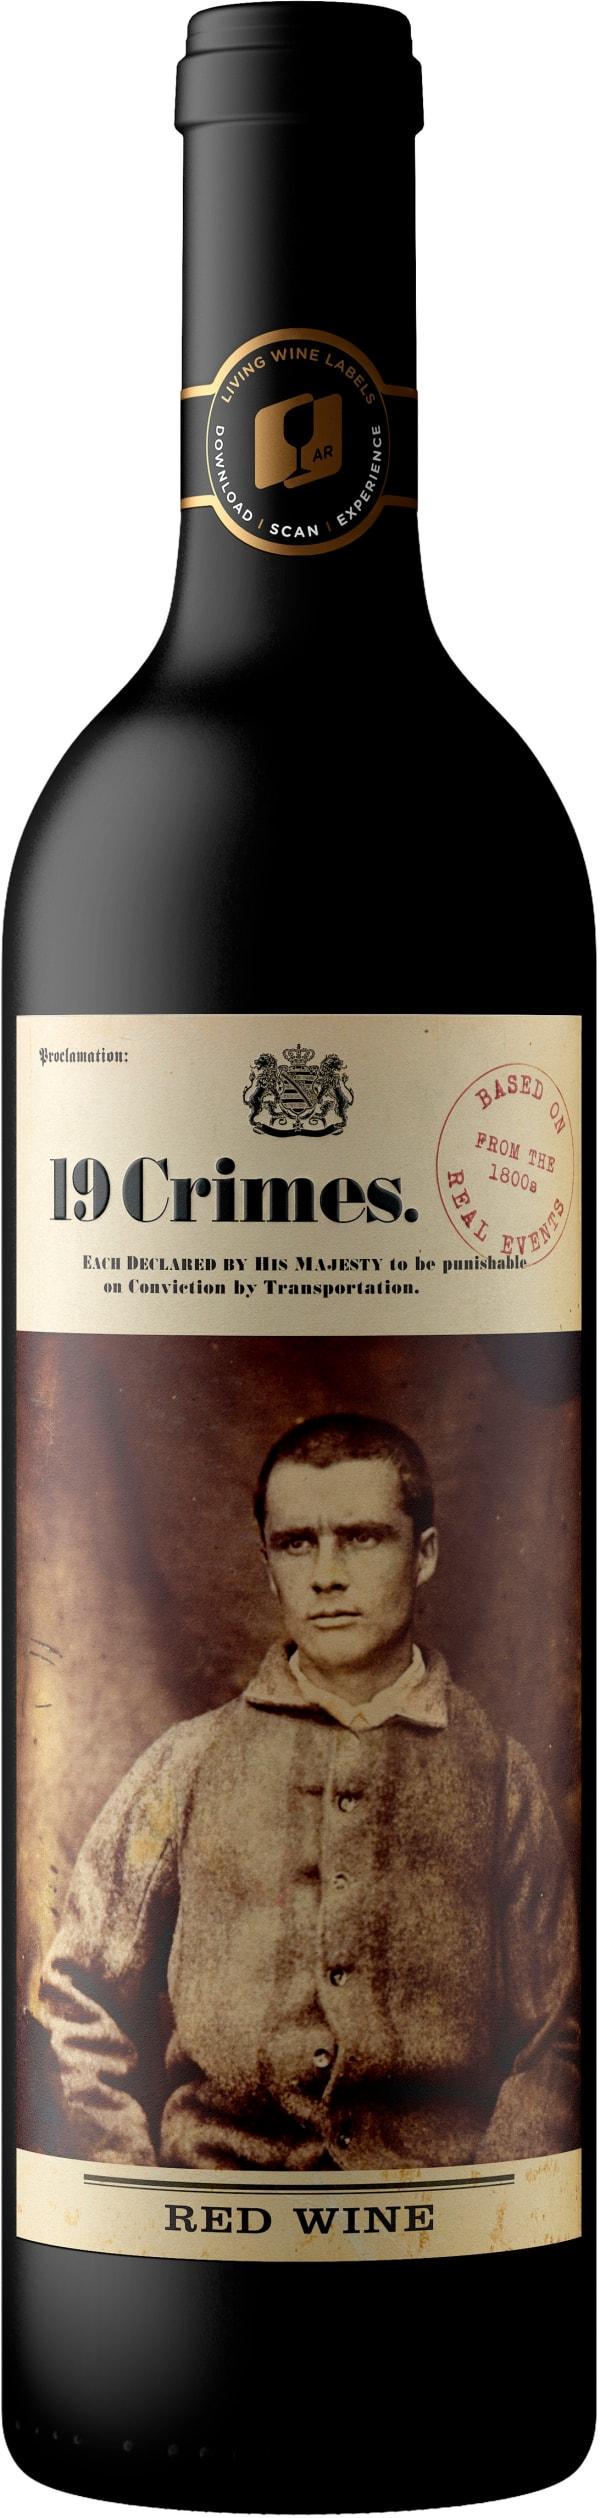 19 Crimes Red wine 2018